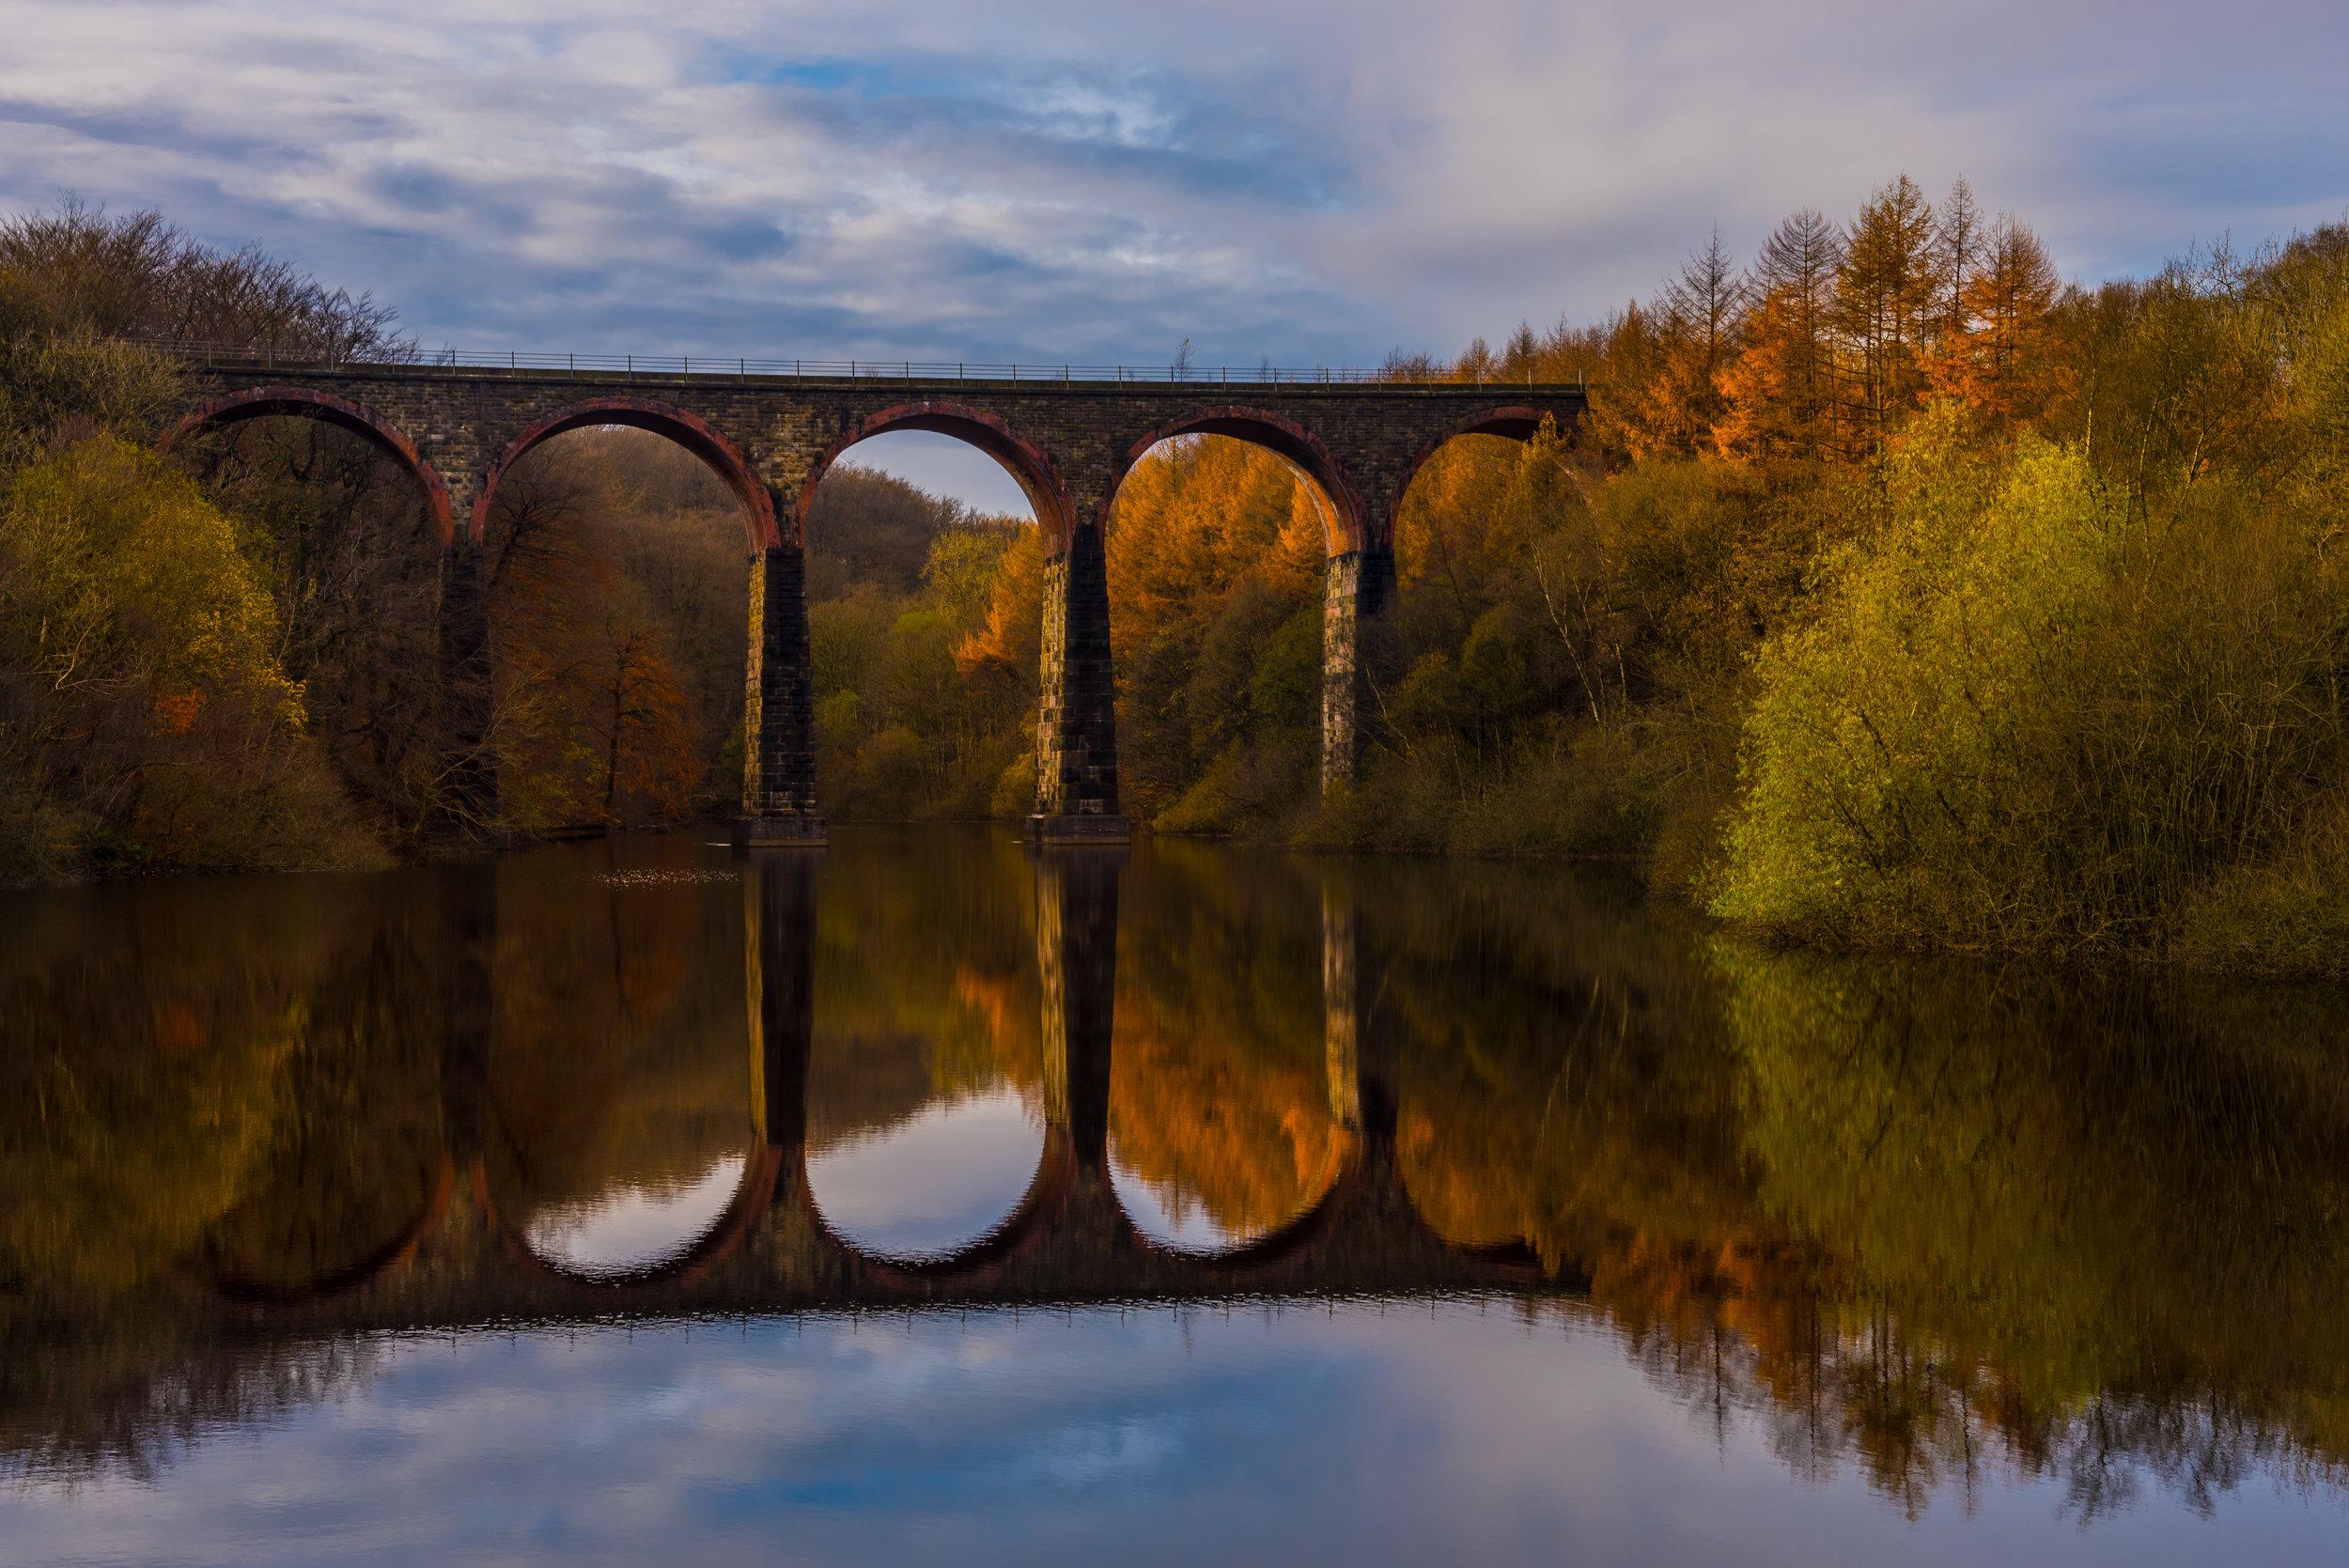 Entwistle viaduct, embraced by autumn colours.